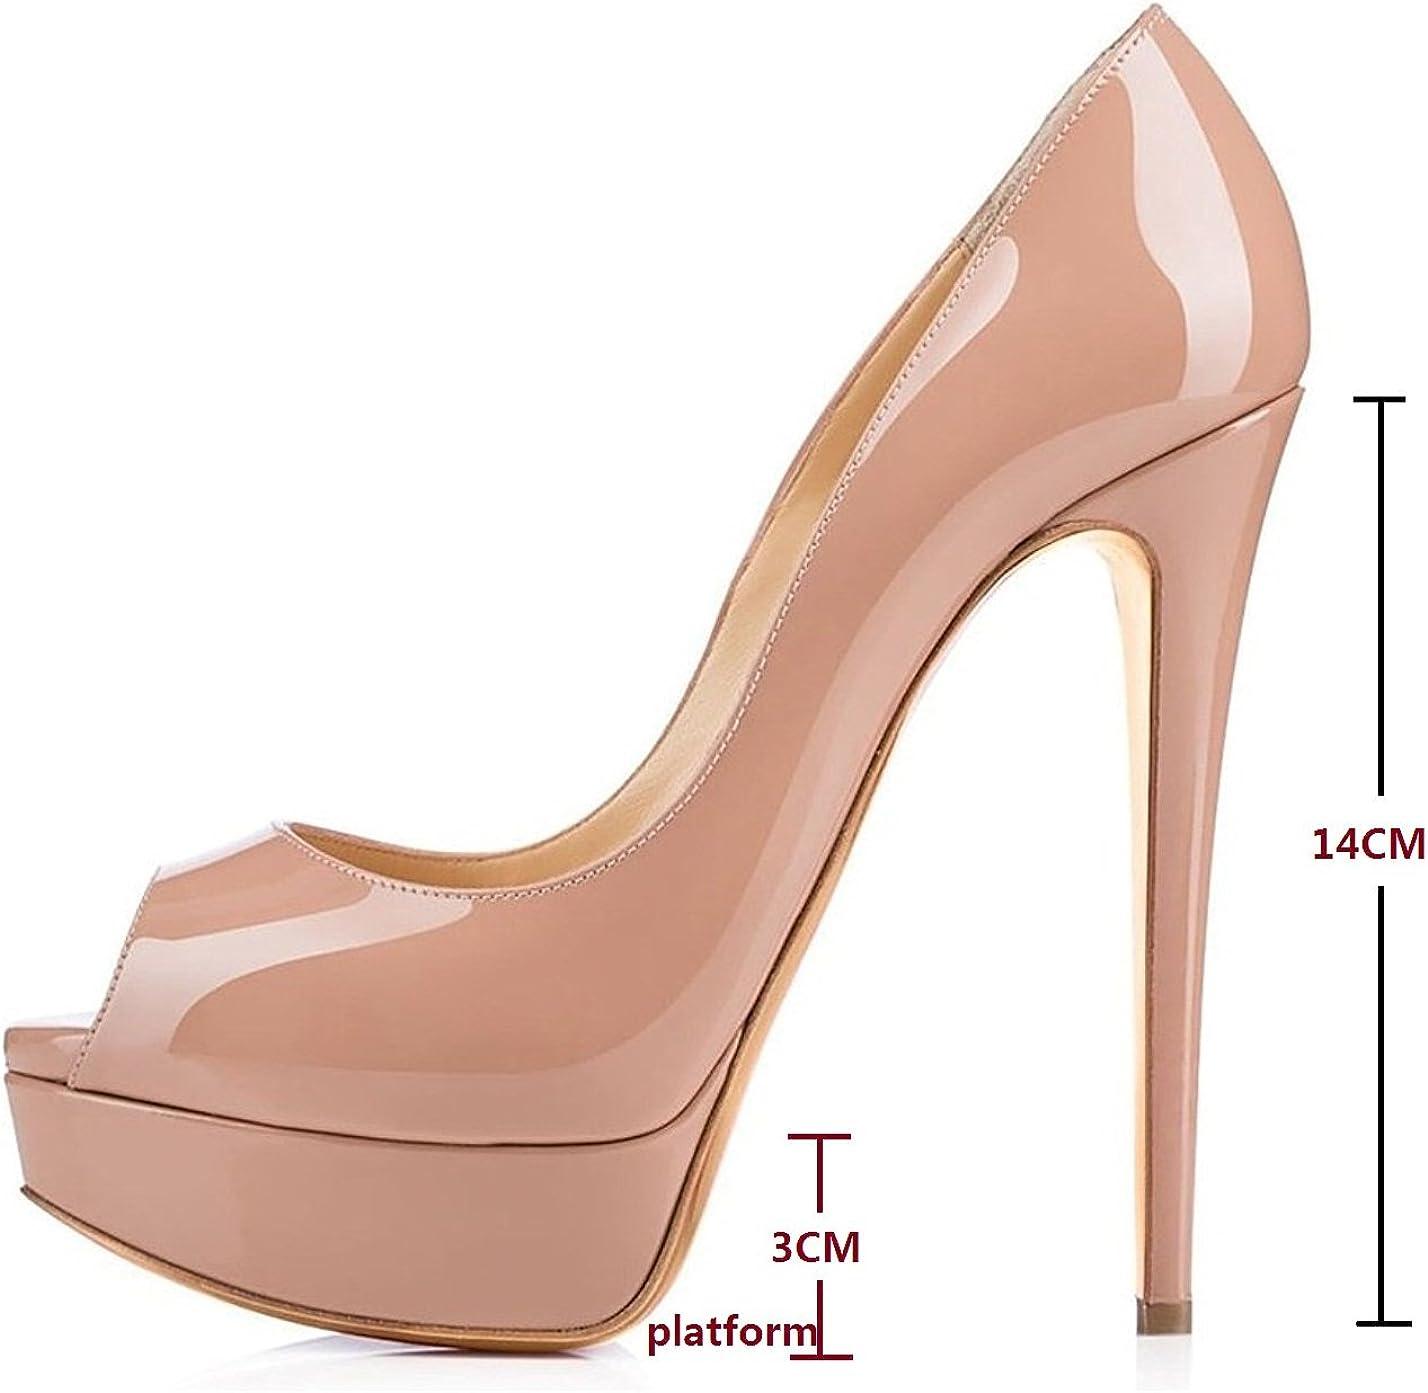 OR ROSE CLAIR PERSPEX Bloc à Talon Haut Talons Peep Toes Sandales Taille